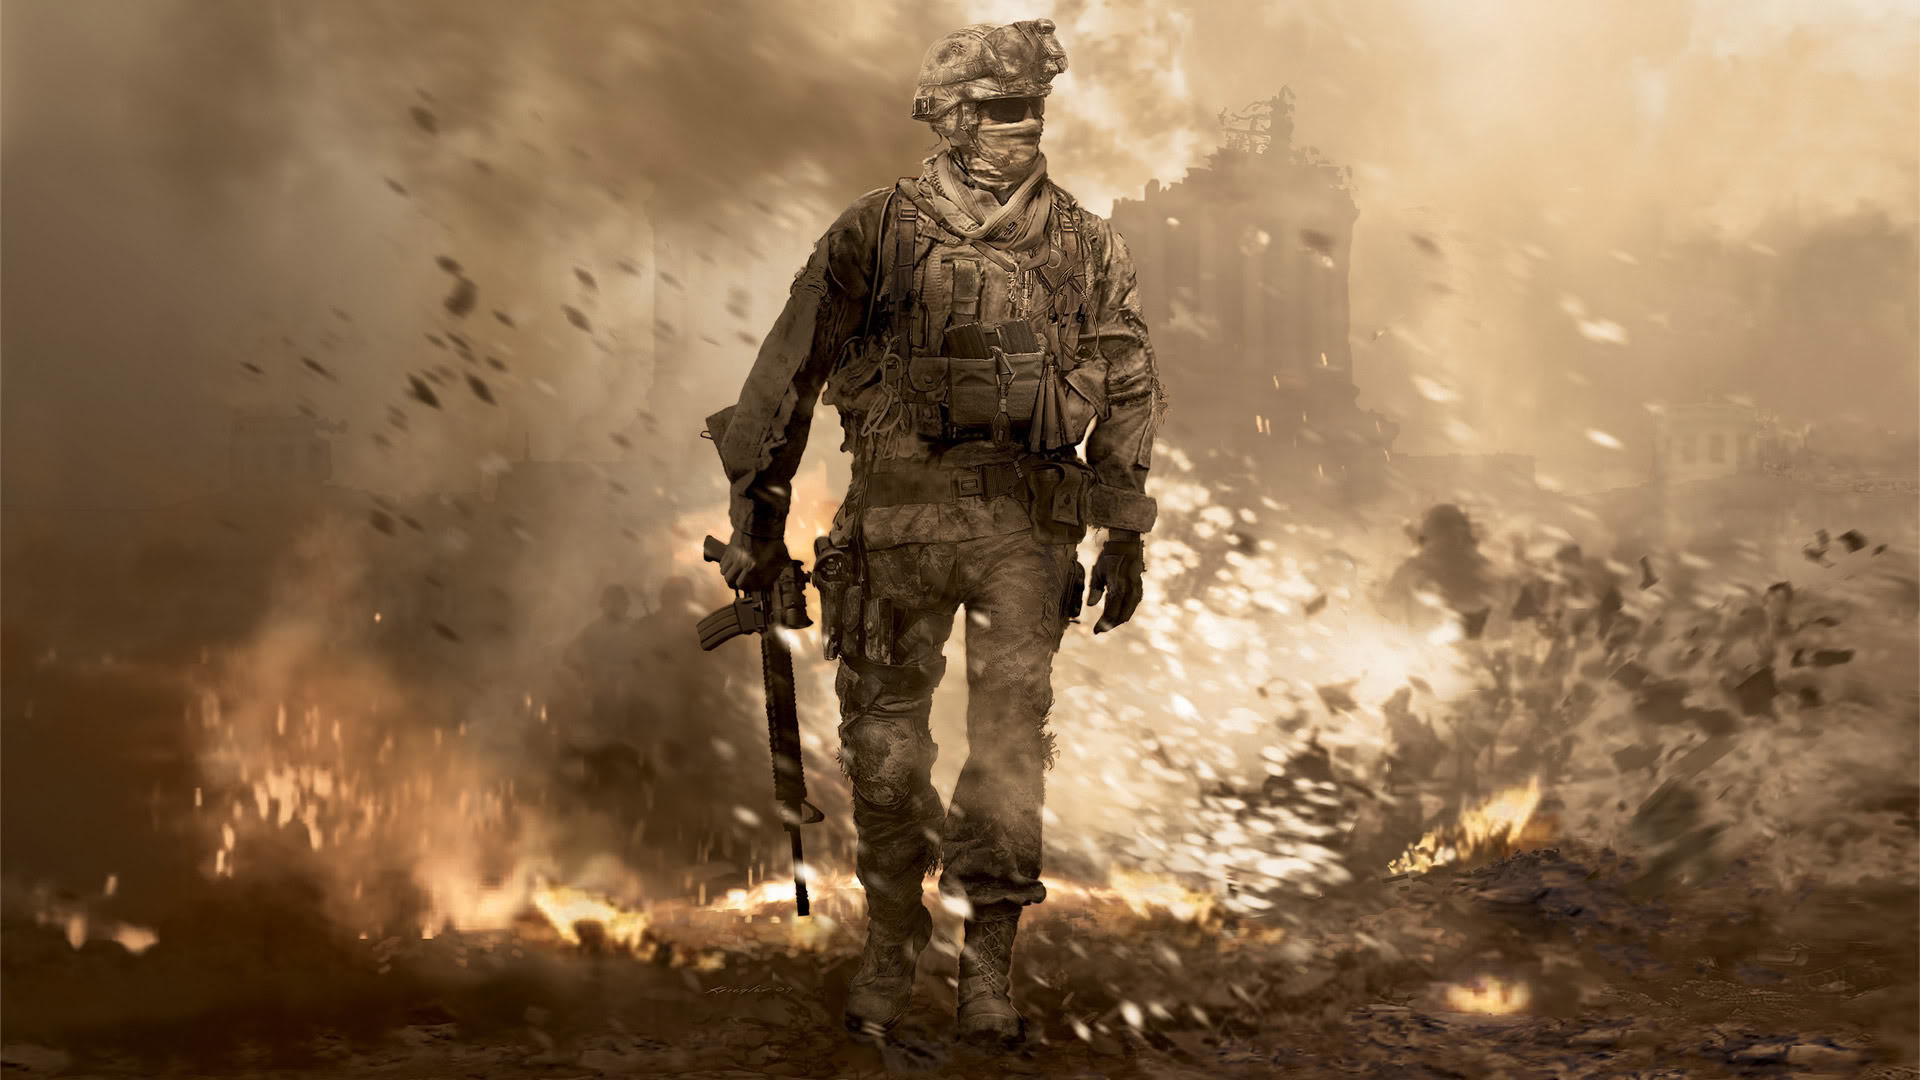 1920x1080, Full Hd Games Wallpapers Group   Data Id - Call Of Duty Hd - HD Wallpaper